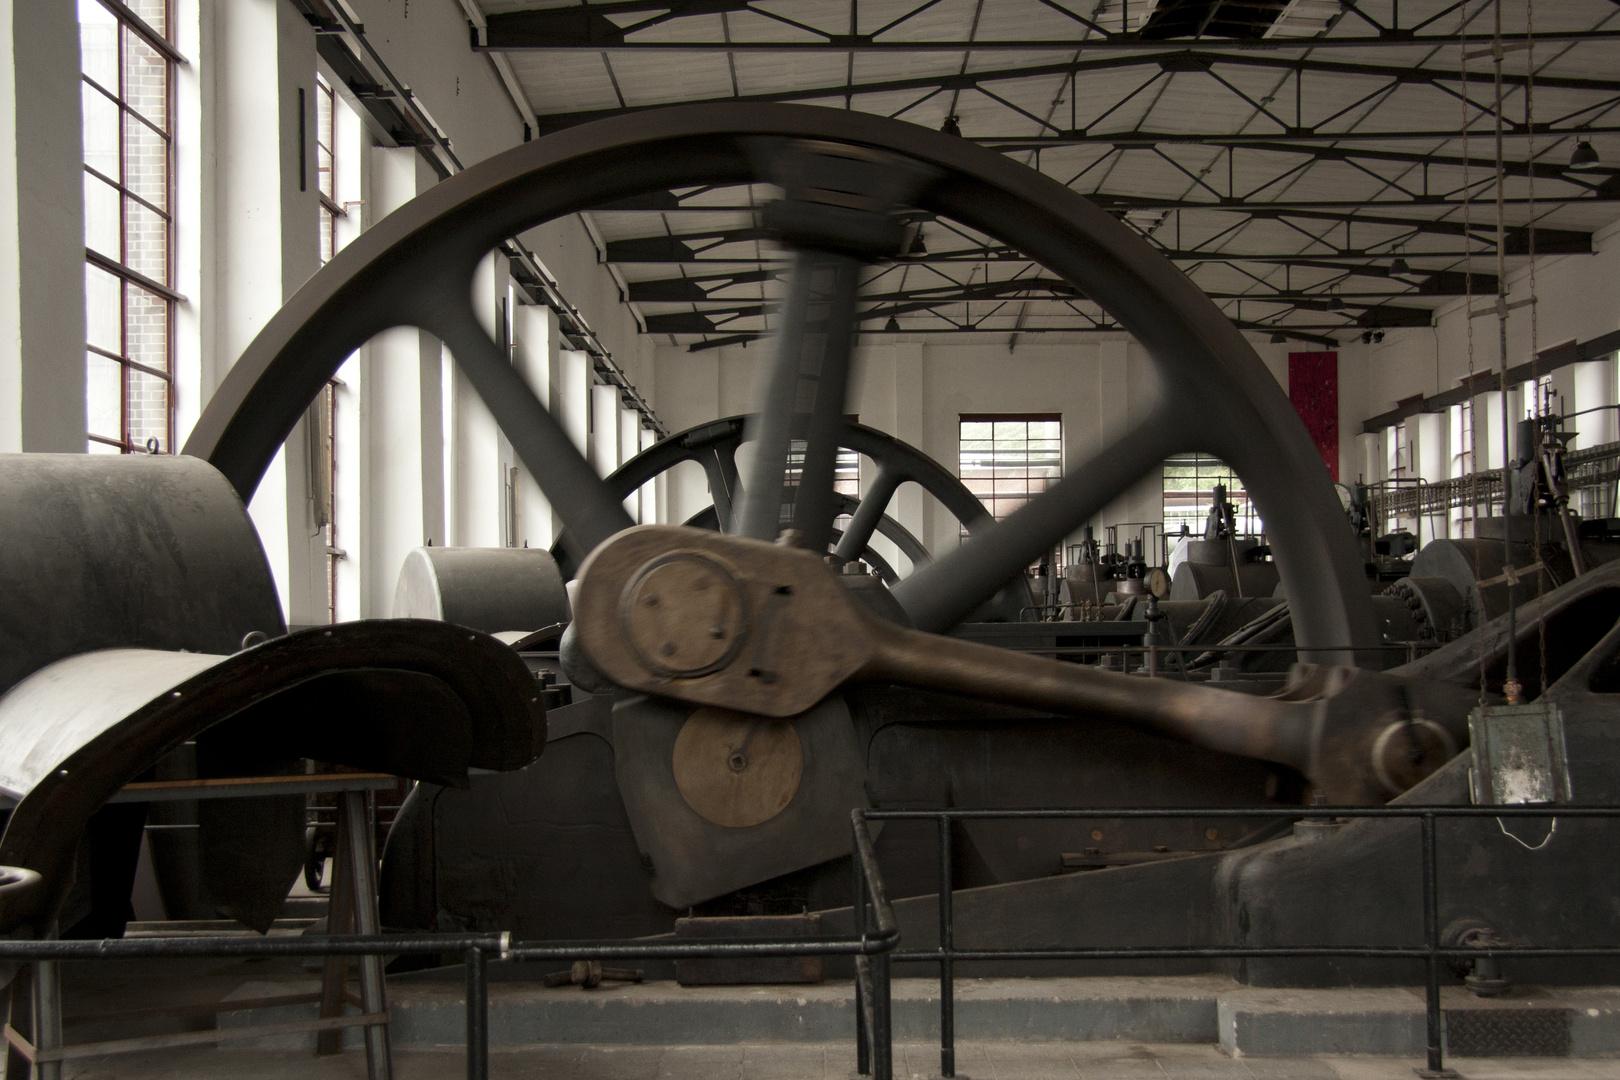 Maschinenhalle